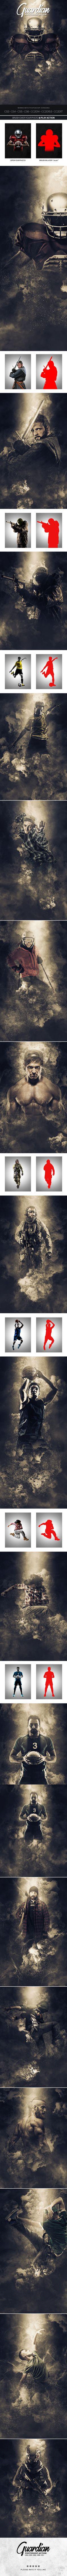 Guardian Photoshop Action — Photoshop ABR #hdr #visual • Download ➝ https://graphicriver.net/item/guardian-photoshop-action/18973546?ref=pxcr